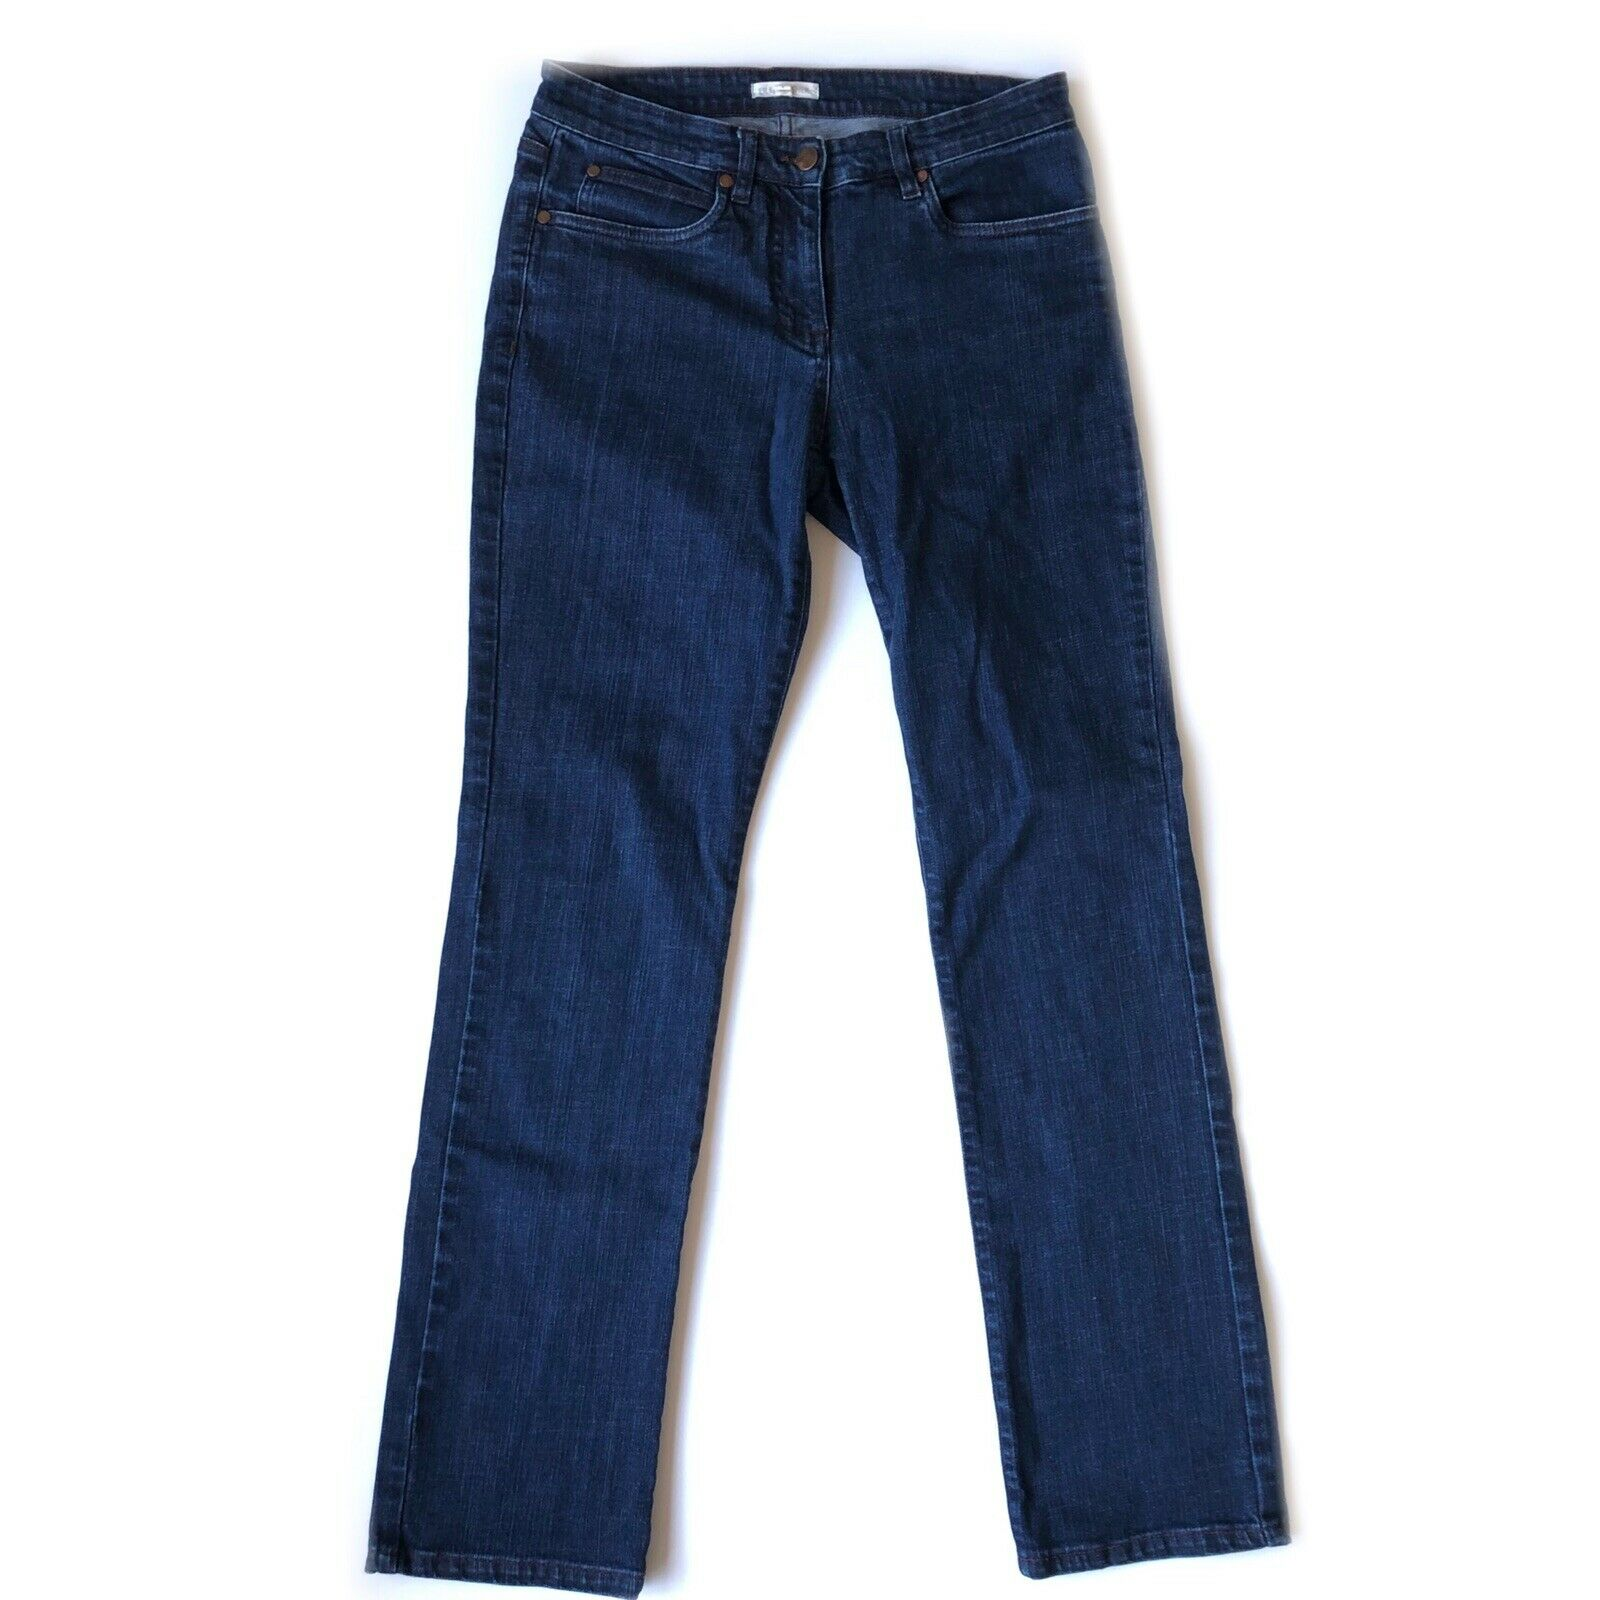 Eileen Fisher Organic Cotton Stretch Straight Jean bluee Size 4 GUC  178 Waist 28